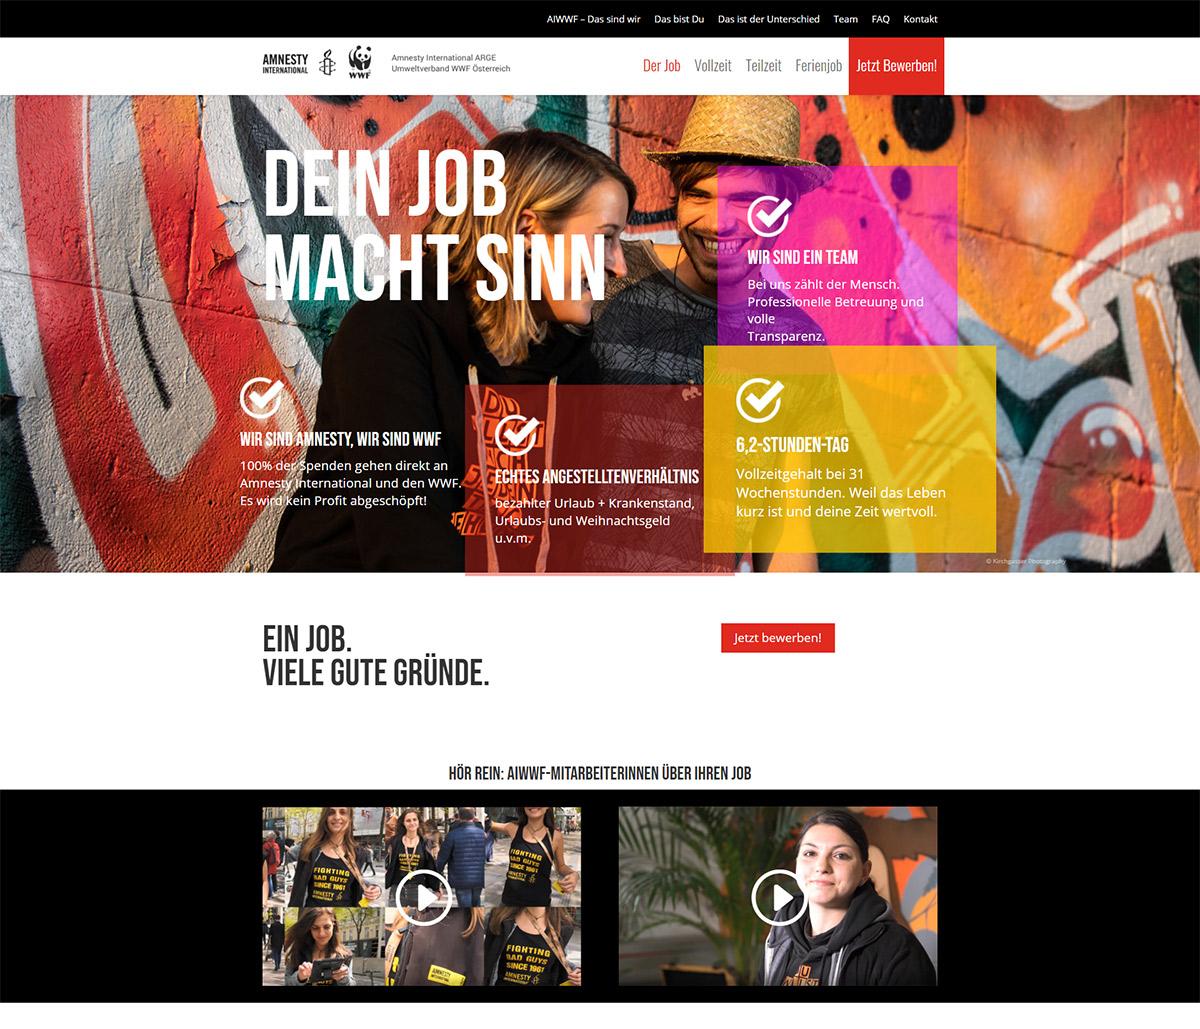 relaunch-aiwwf-iservice-agentur-wien-page-dein-job